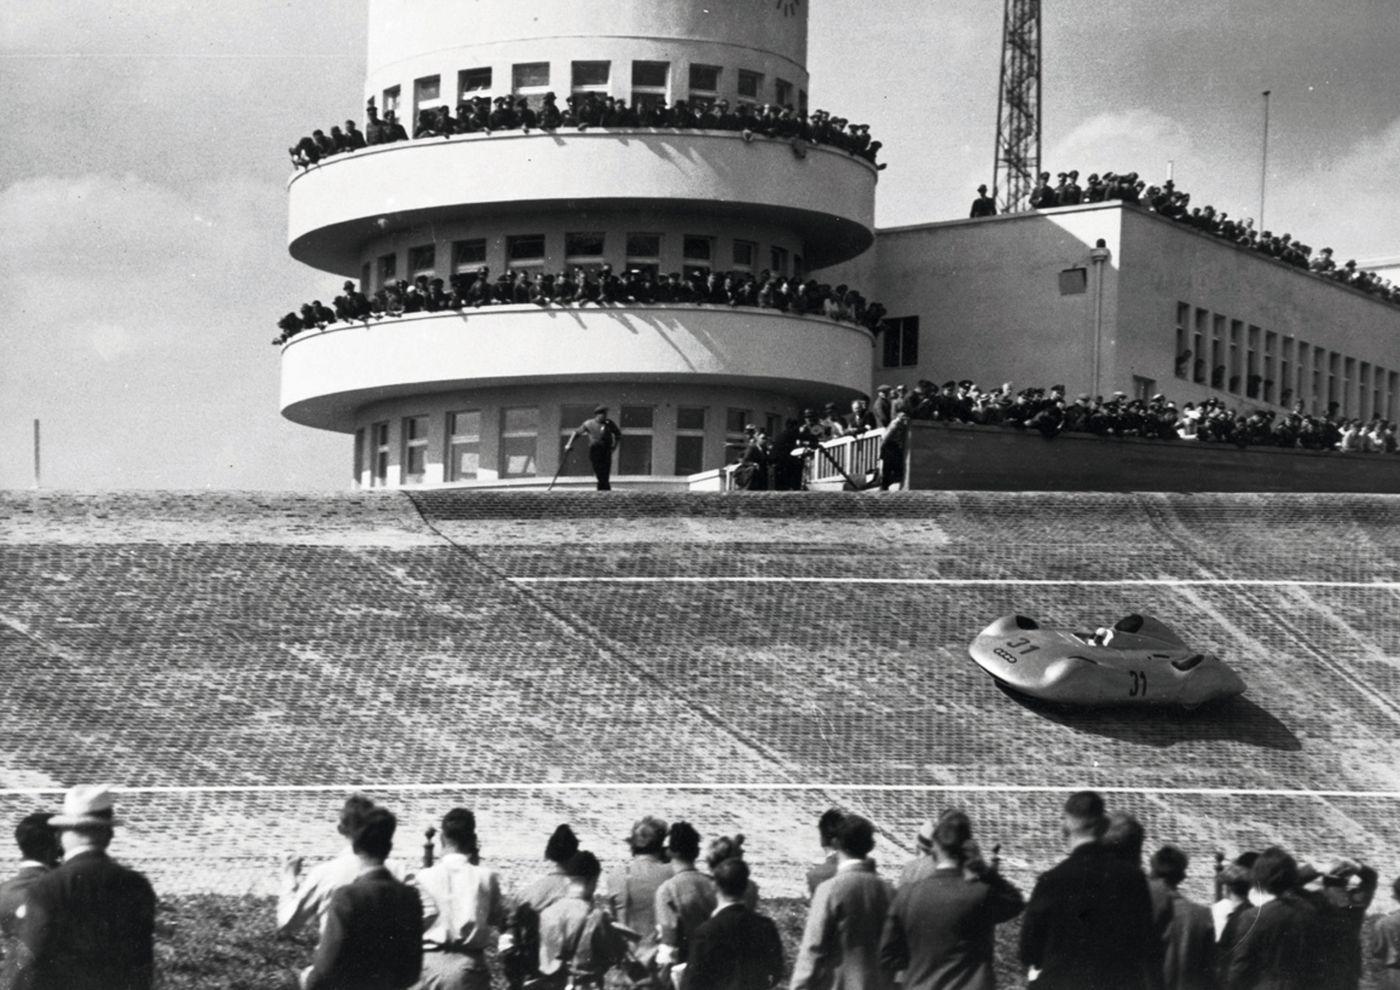 Eröffnung der AVUS Steilkurve 1937 Bernd Rosemeyer Auto Union (18)